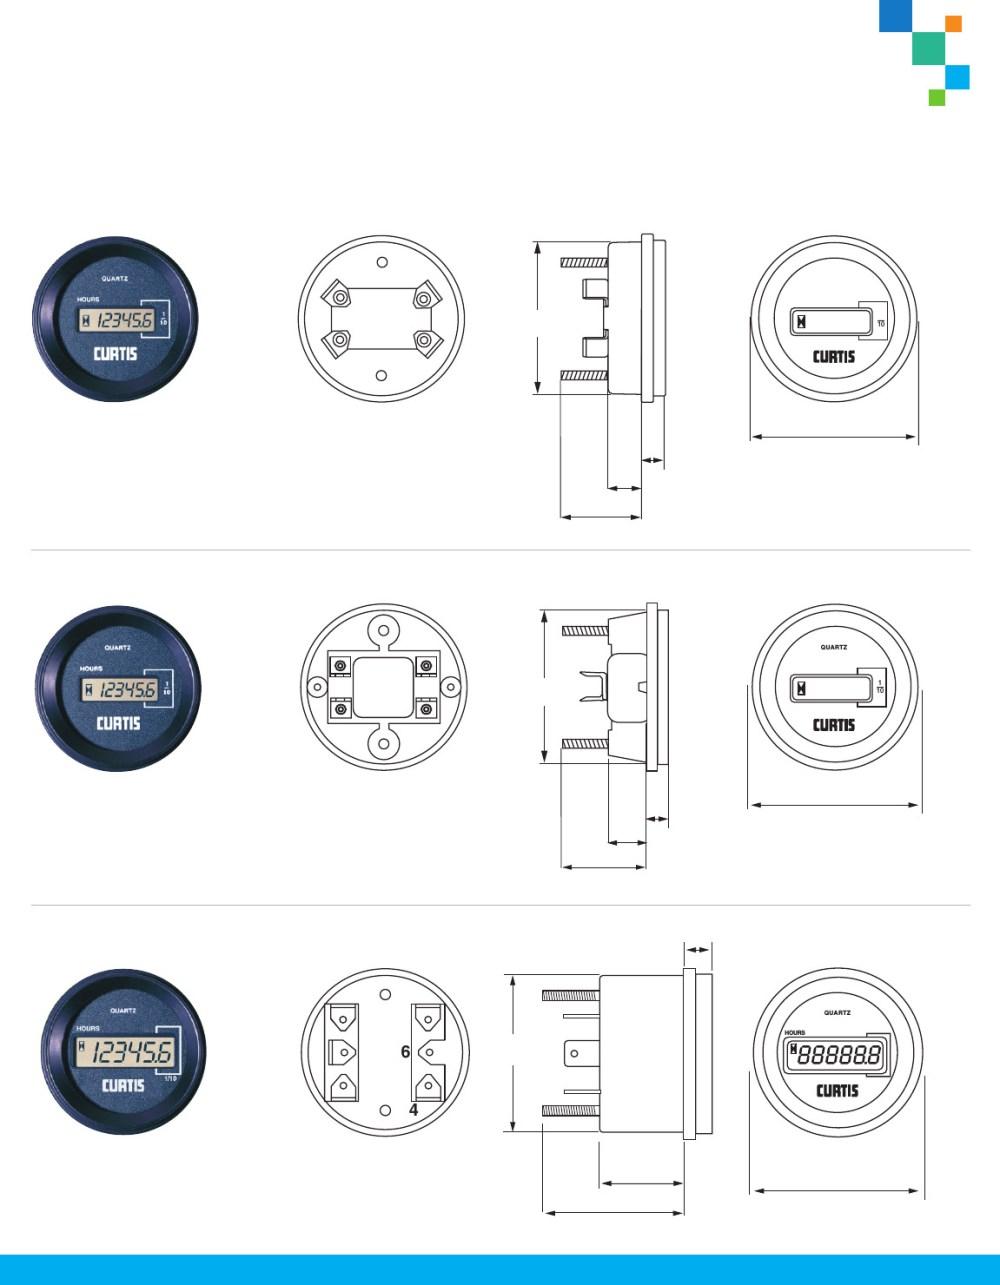 medium resolution of curtis wiring diagram my wiring diagramcurtis meters wiring diagrams wiring diagram name curtis 3000 wiring diagram